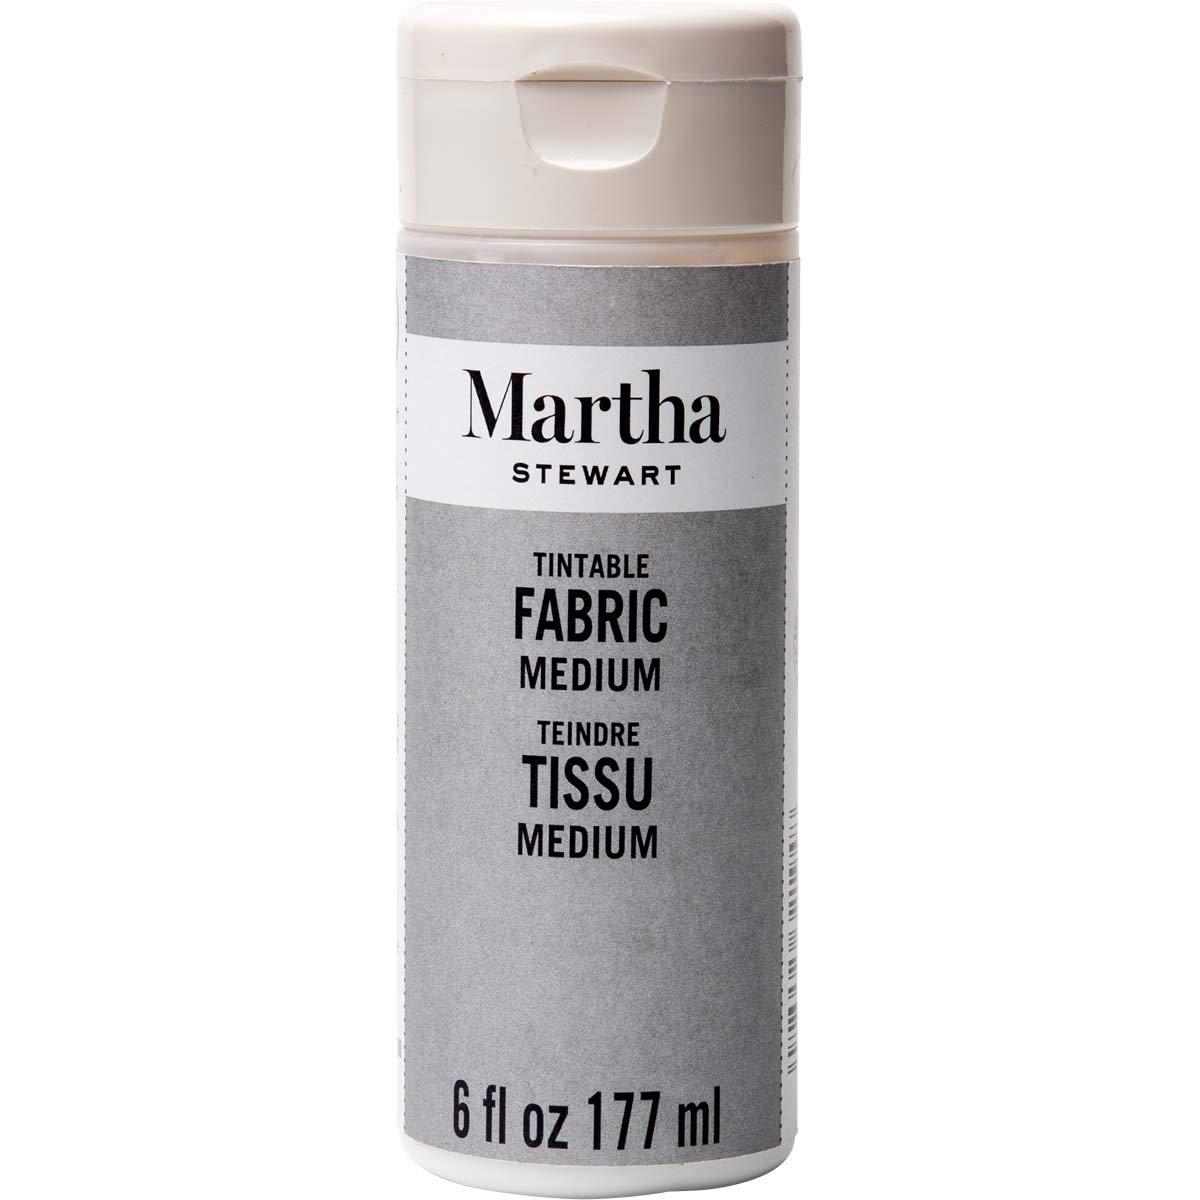 Martha Stewart Crafts Martha Stewart Tintable Fabric Medium Paint, 6 oz